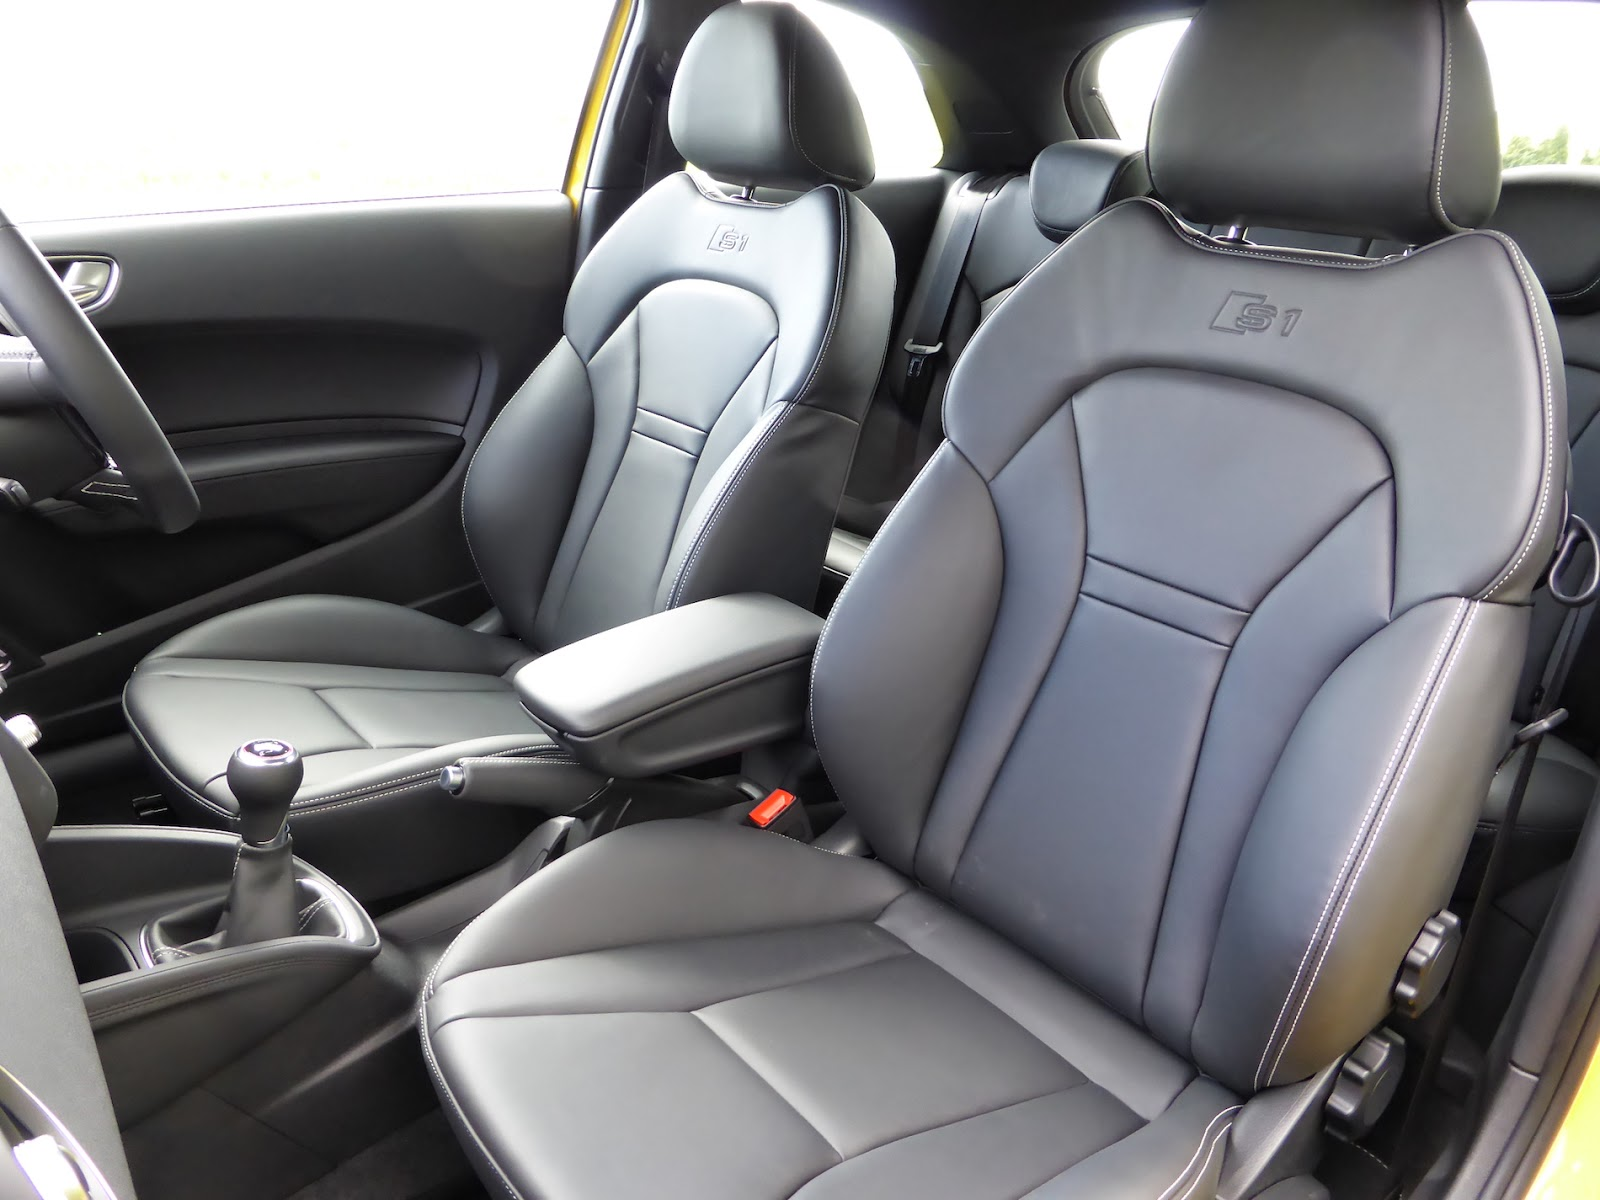 2014 Audi S1 seats